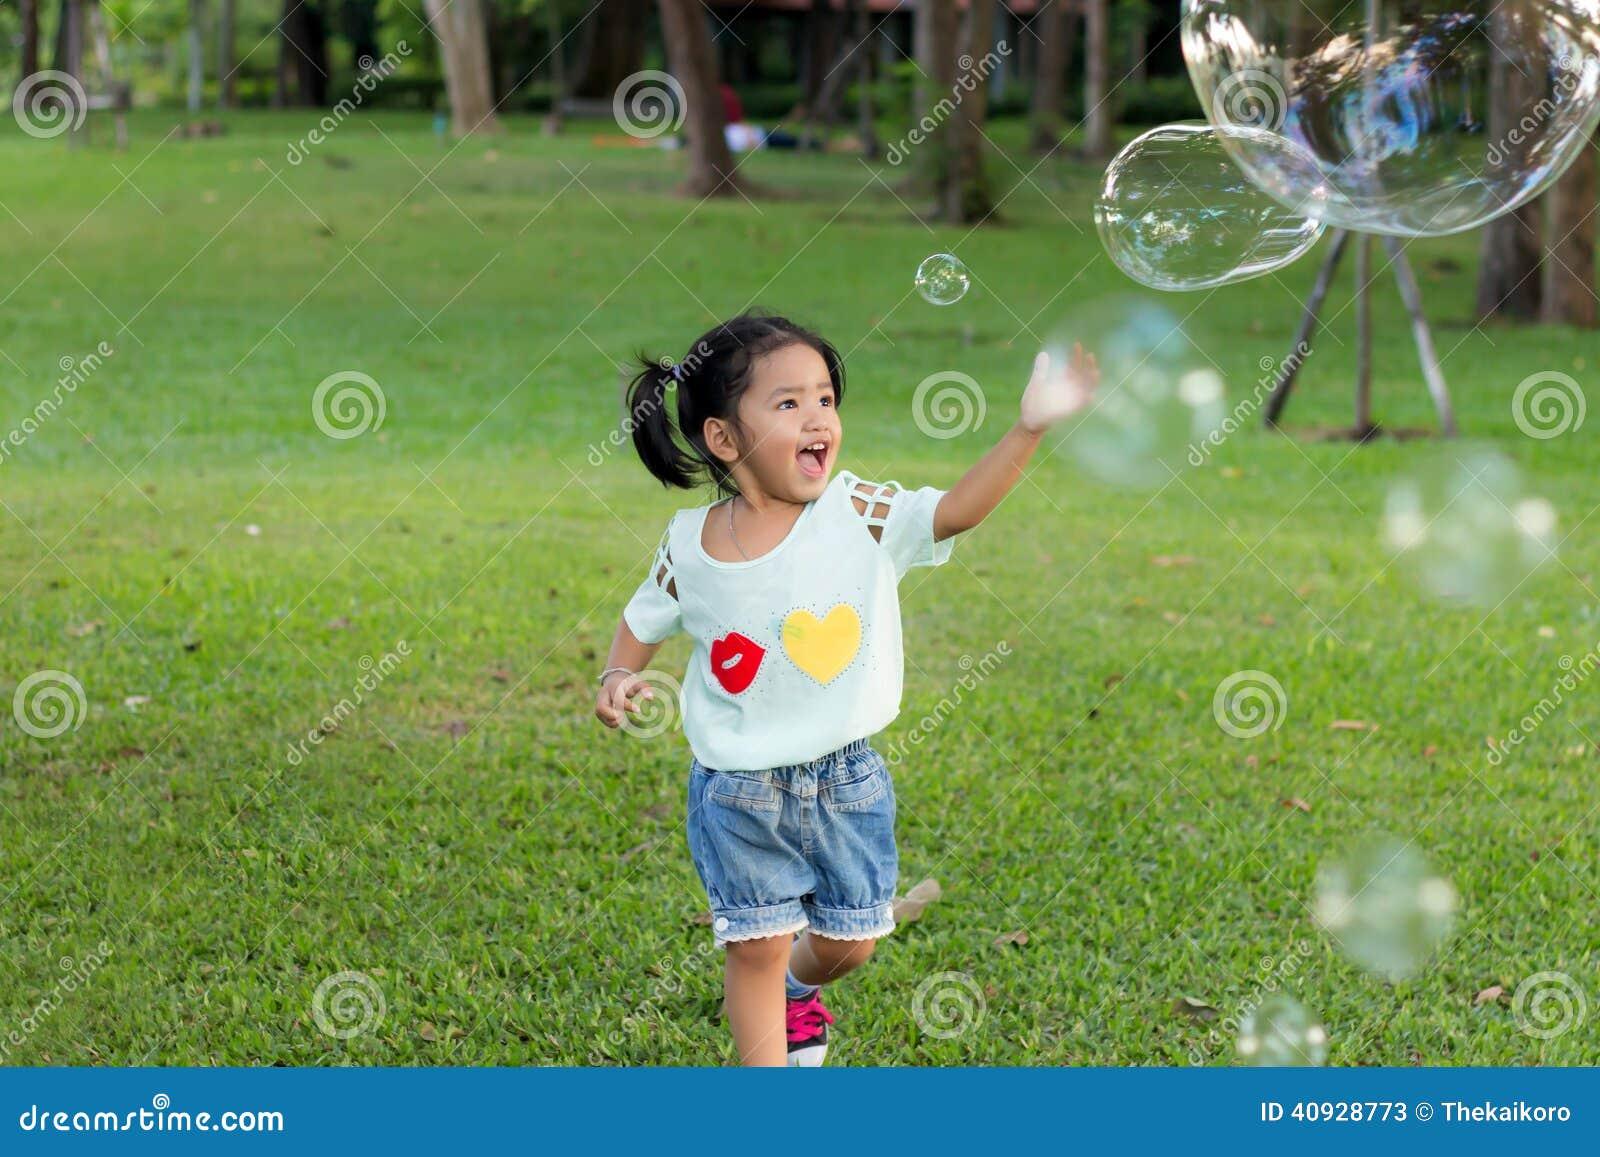 Balloon play cute asian girl striptease 3